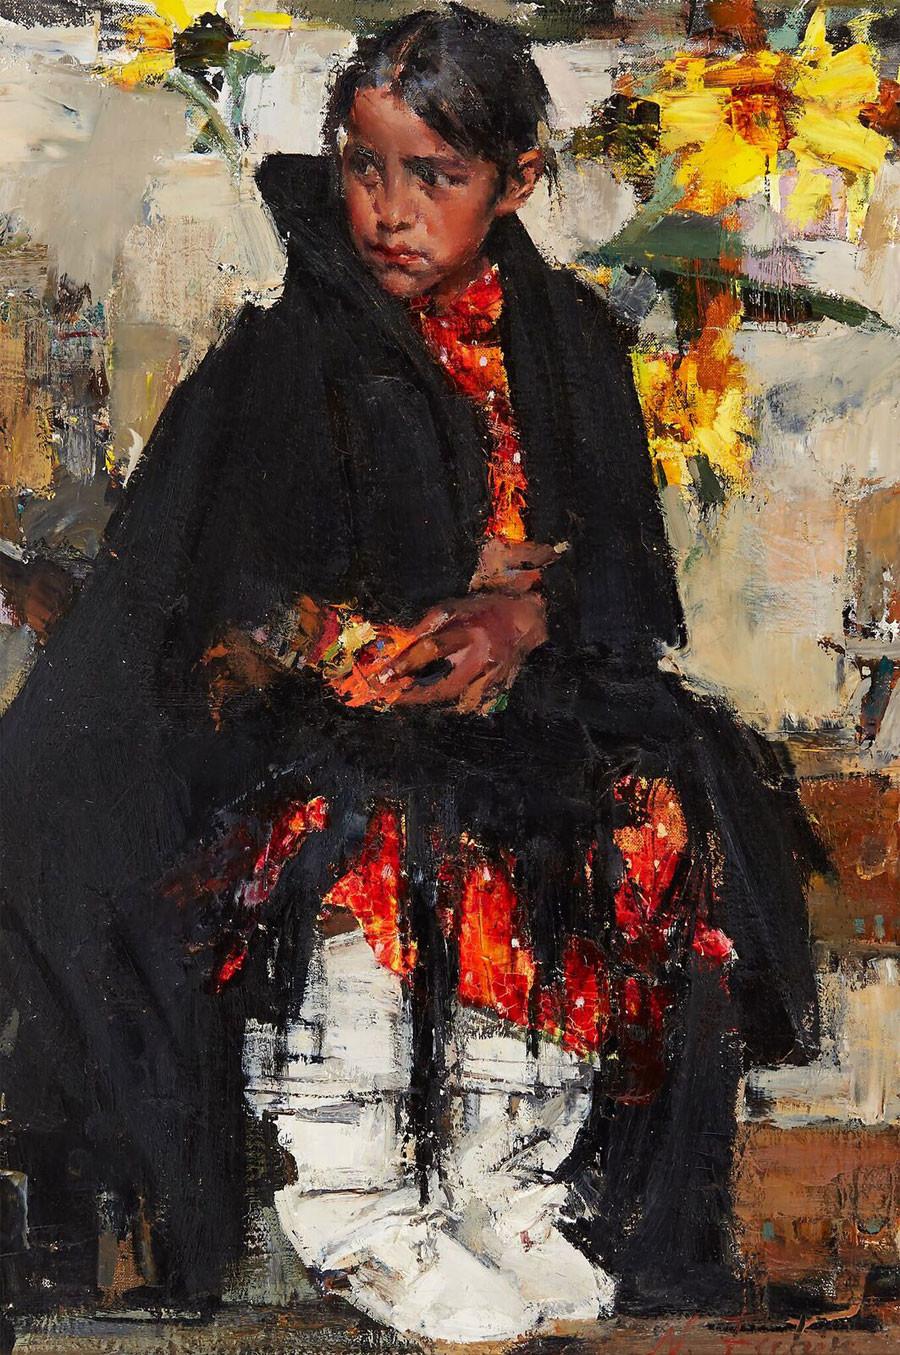 Nicolai Fechin. Indian Girl with Sunflowers © Art Russe